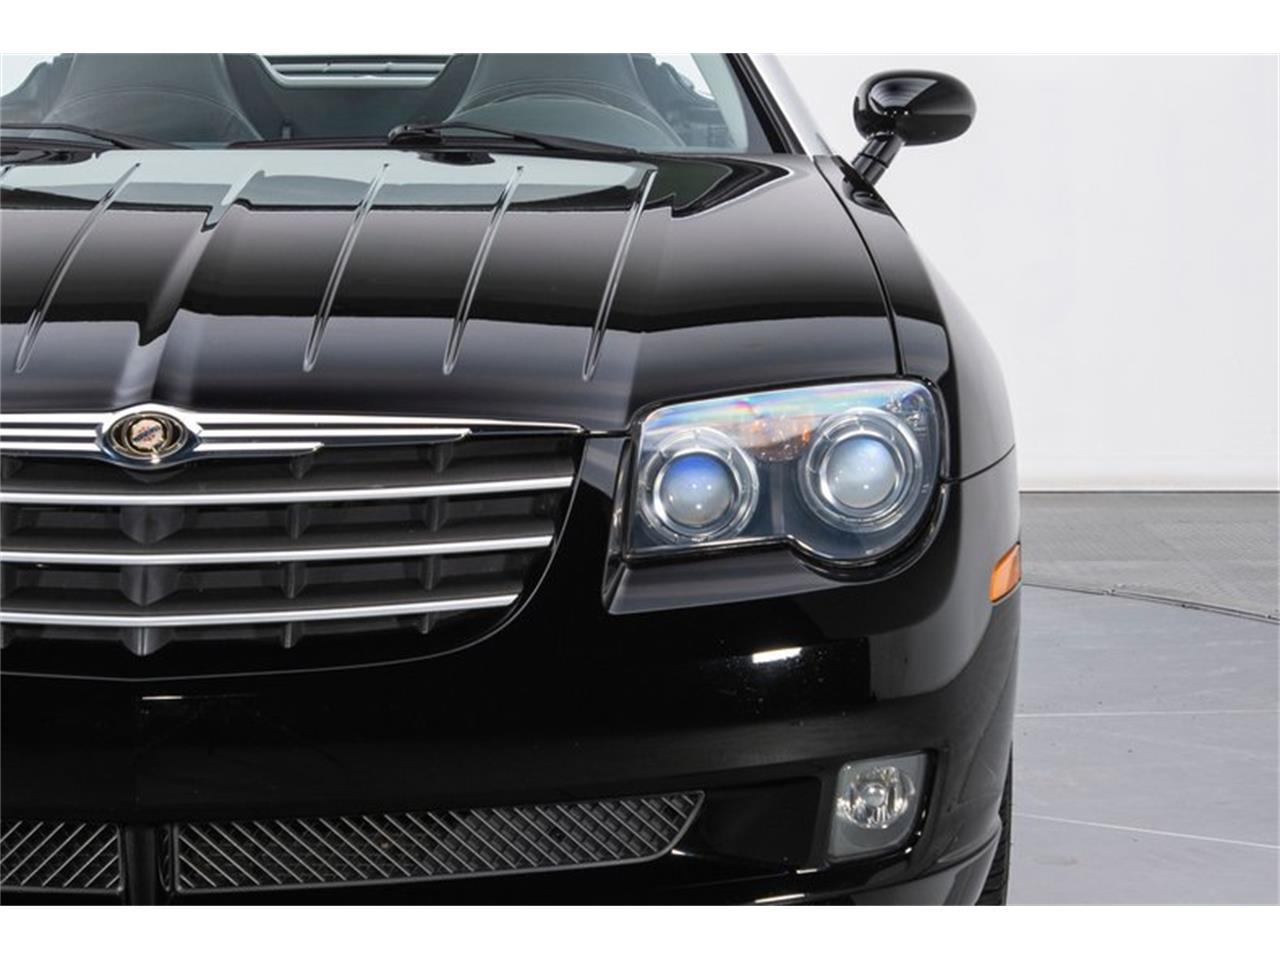 2005 Chrysler Crossfire (CC-1380550) for sale in Charlotte, North Carolina